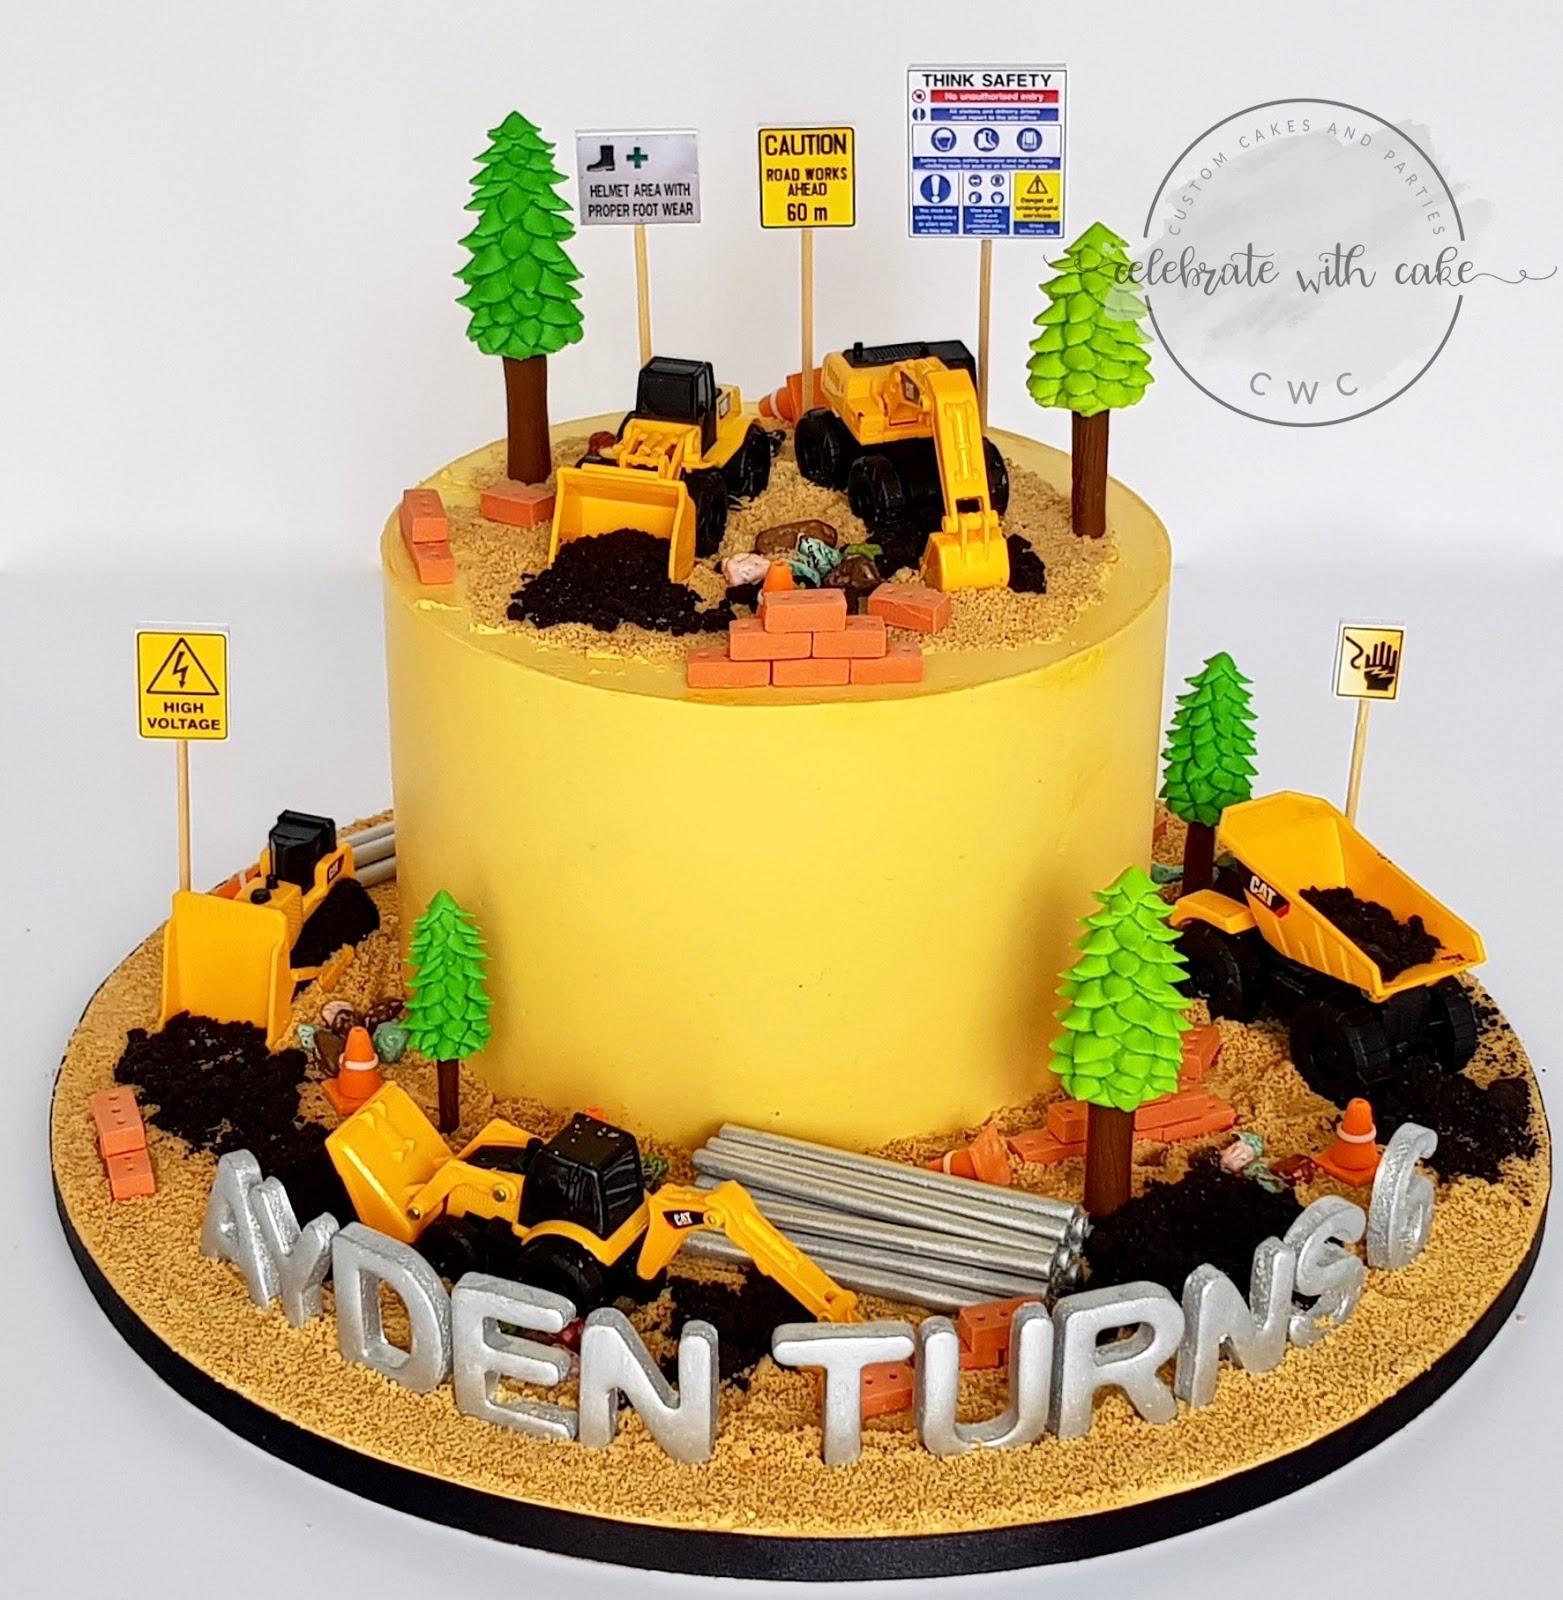 Surprising Celebrate With Cake Construction Site Single Tier Cake Funny Birthday Cards Online Alyptdamsfinfo